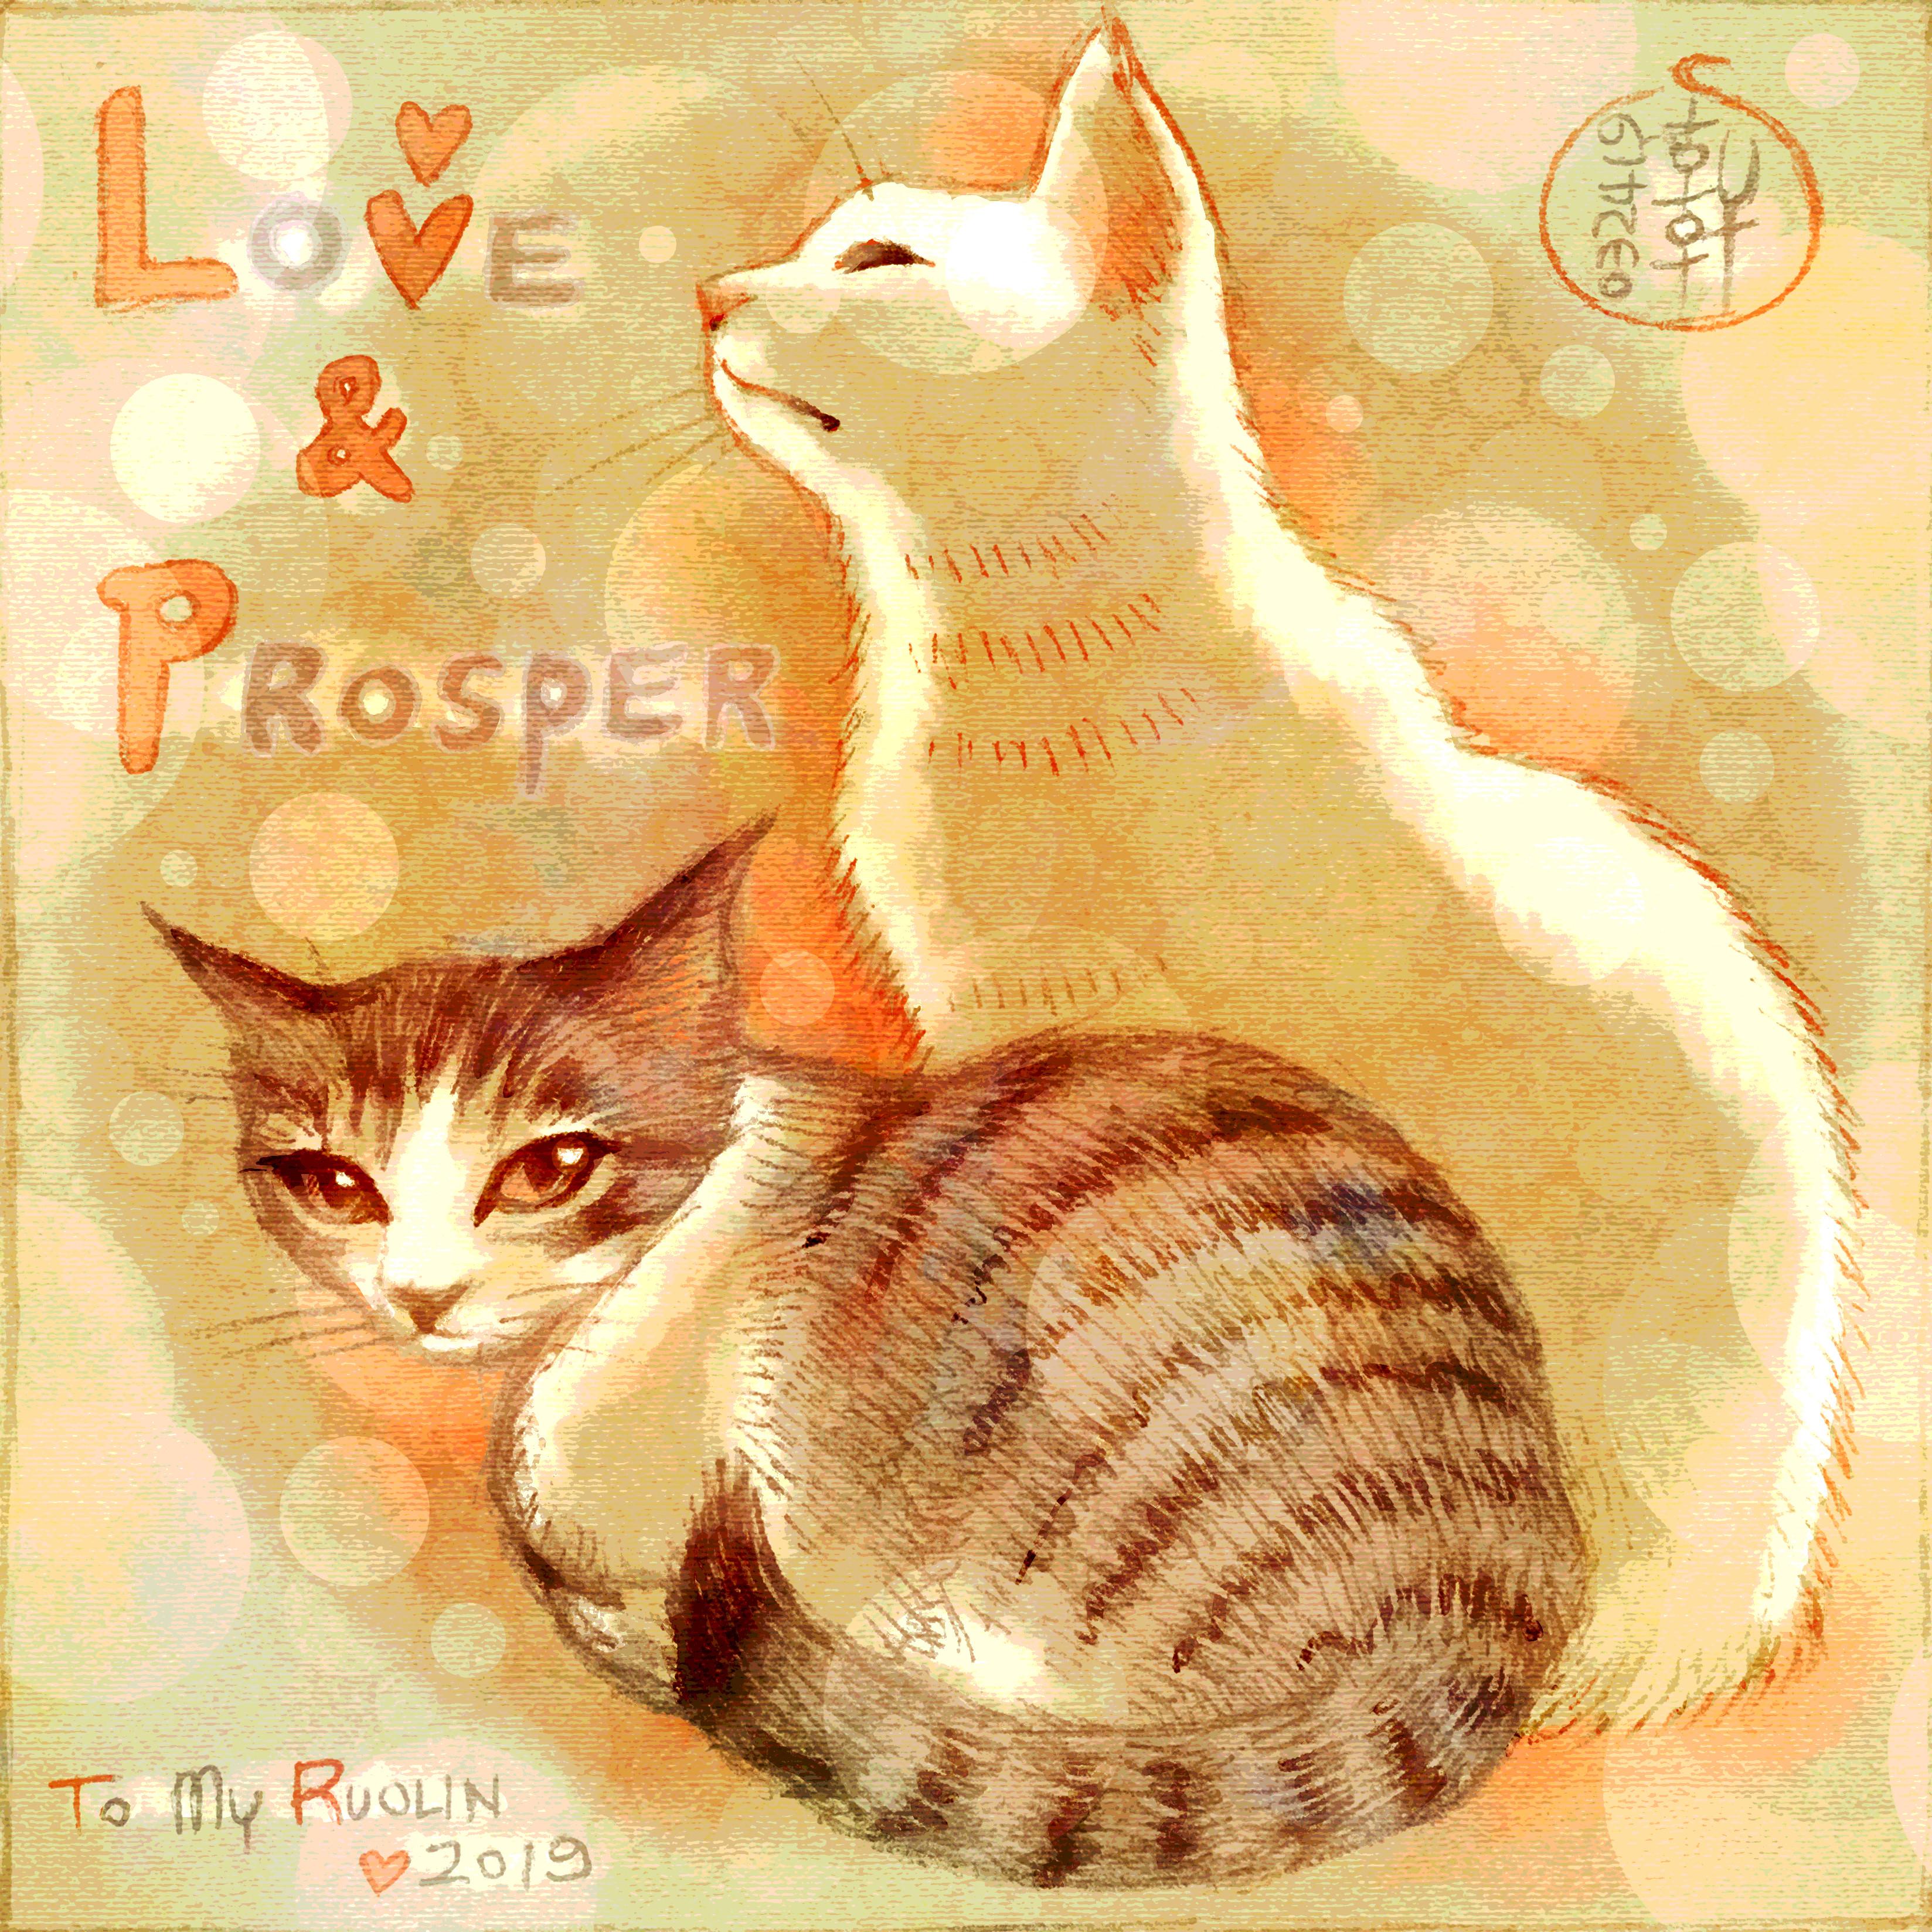 Love and Prosper